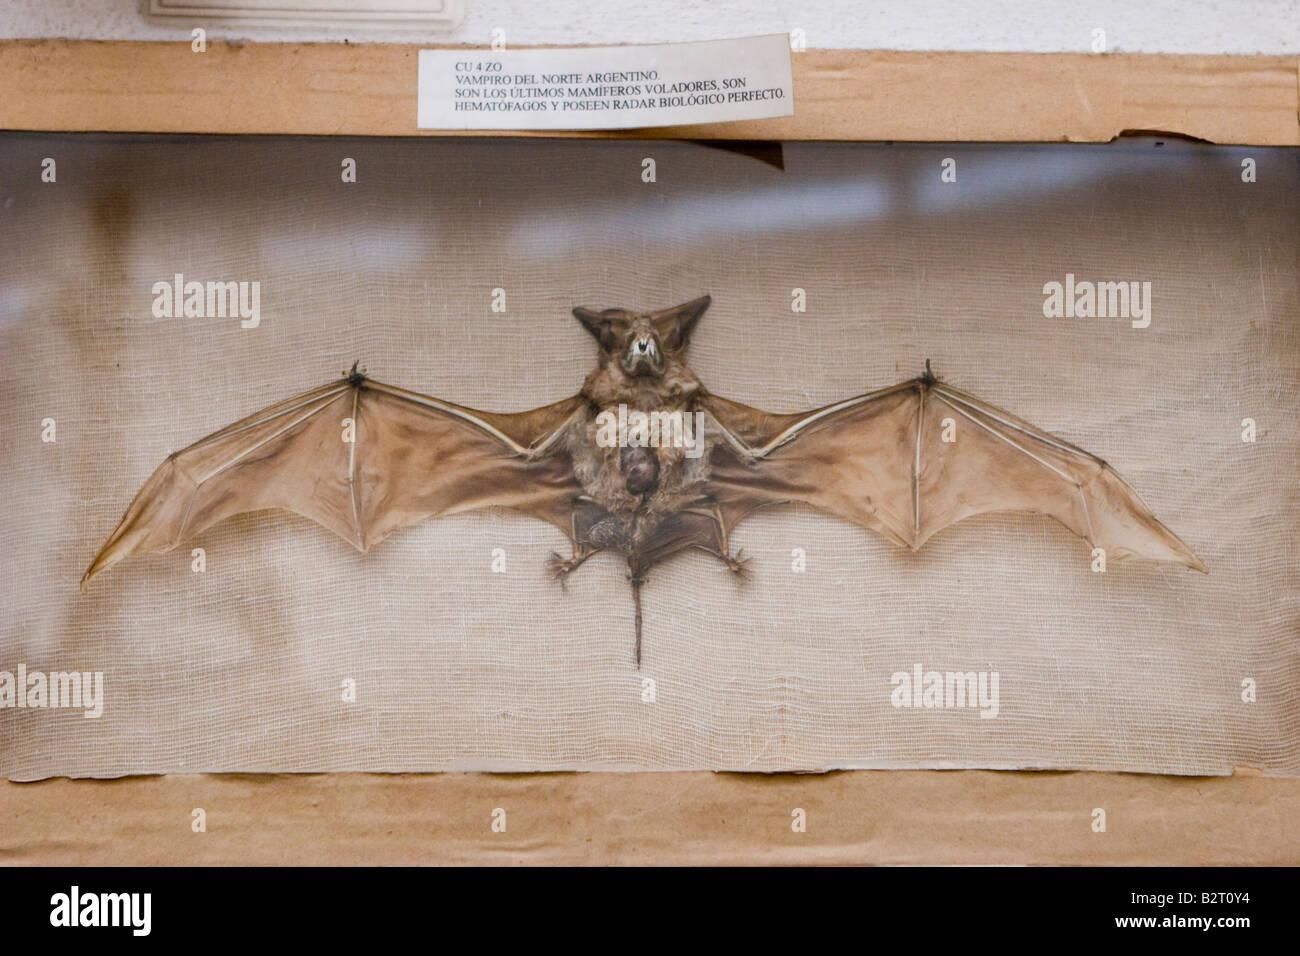 Vampiro argentino haematophagous bat esposti nel museo Rocsen (Museo Polifacetico) nel nono, Cordoba, Argentina Immagini Stock